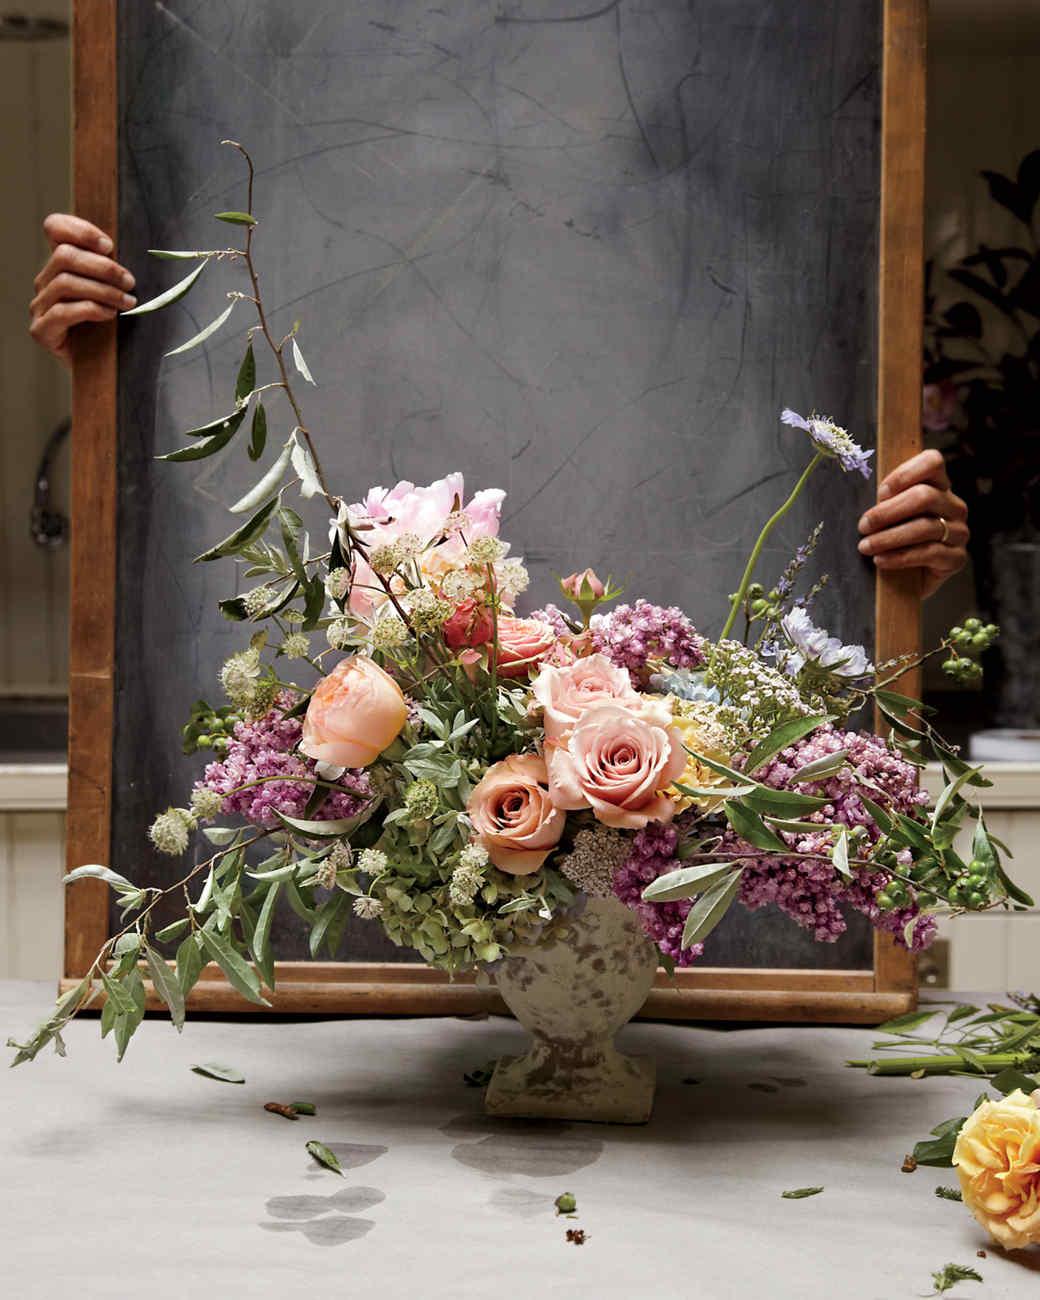 floral-arrangement2-mld107663.jpg